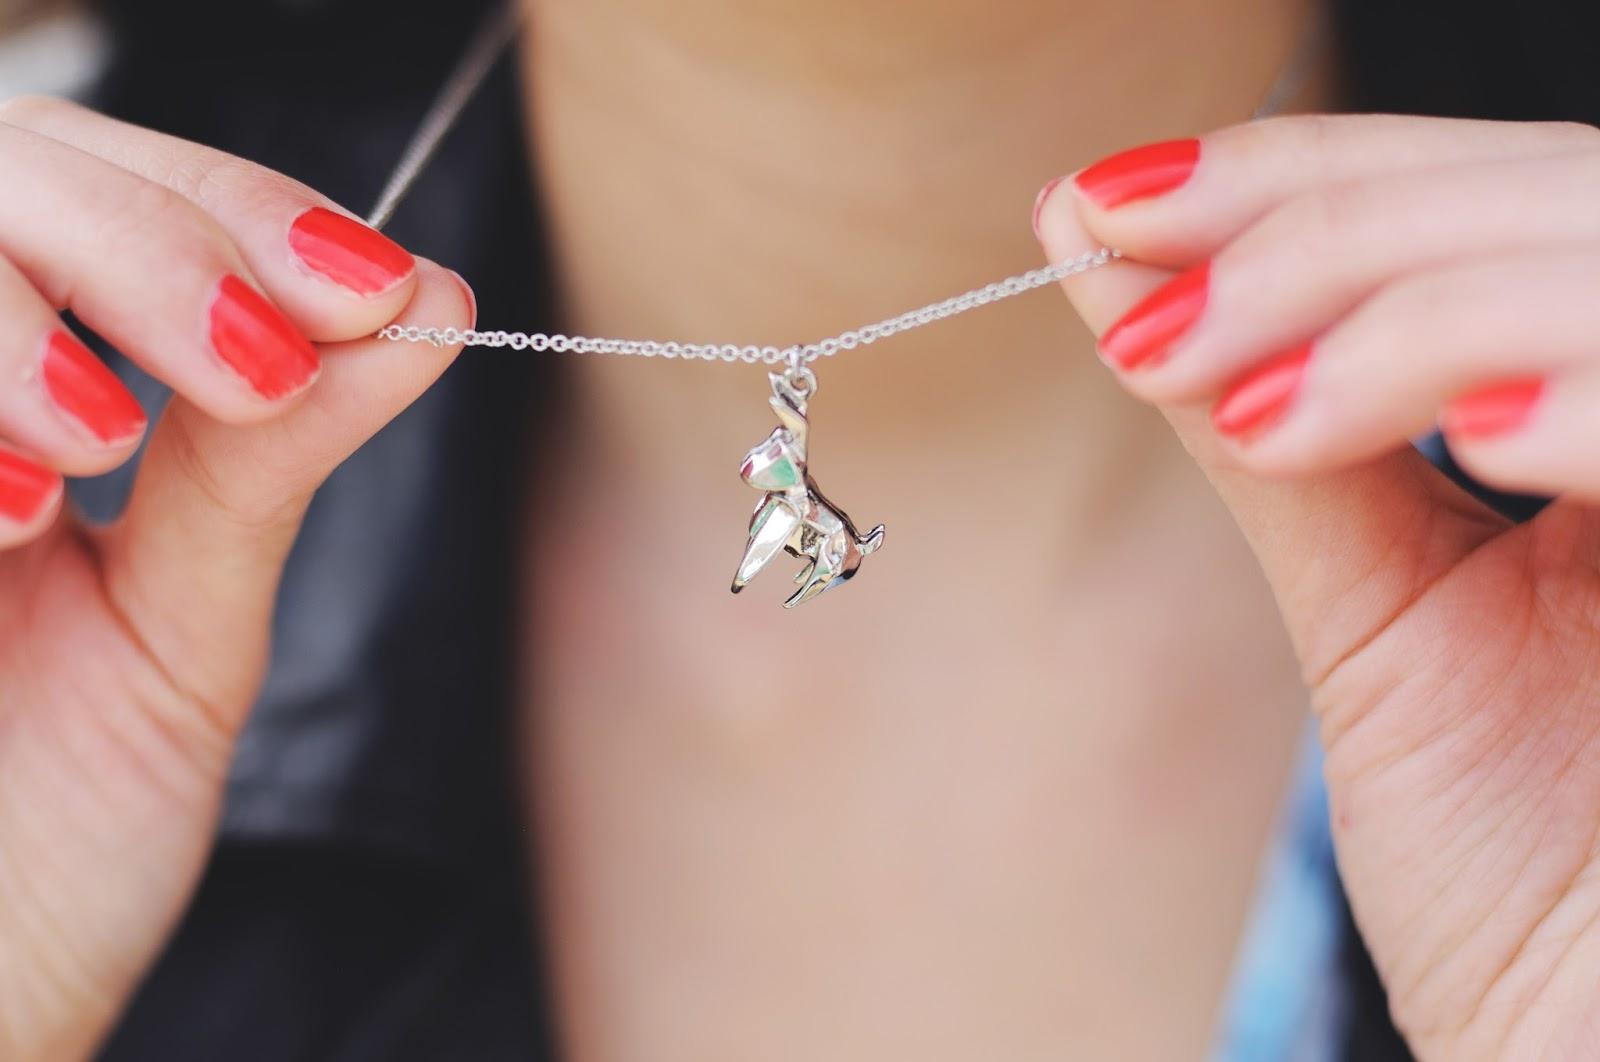 Quirky jewellery, origami jewellery, rabbit jewellery